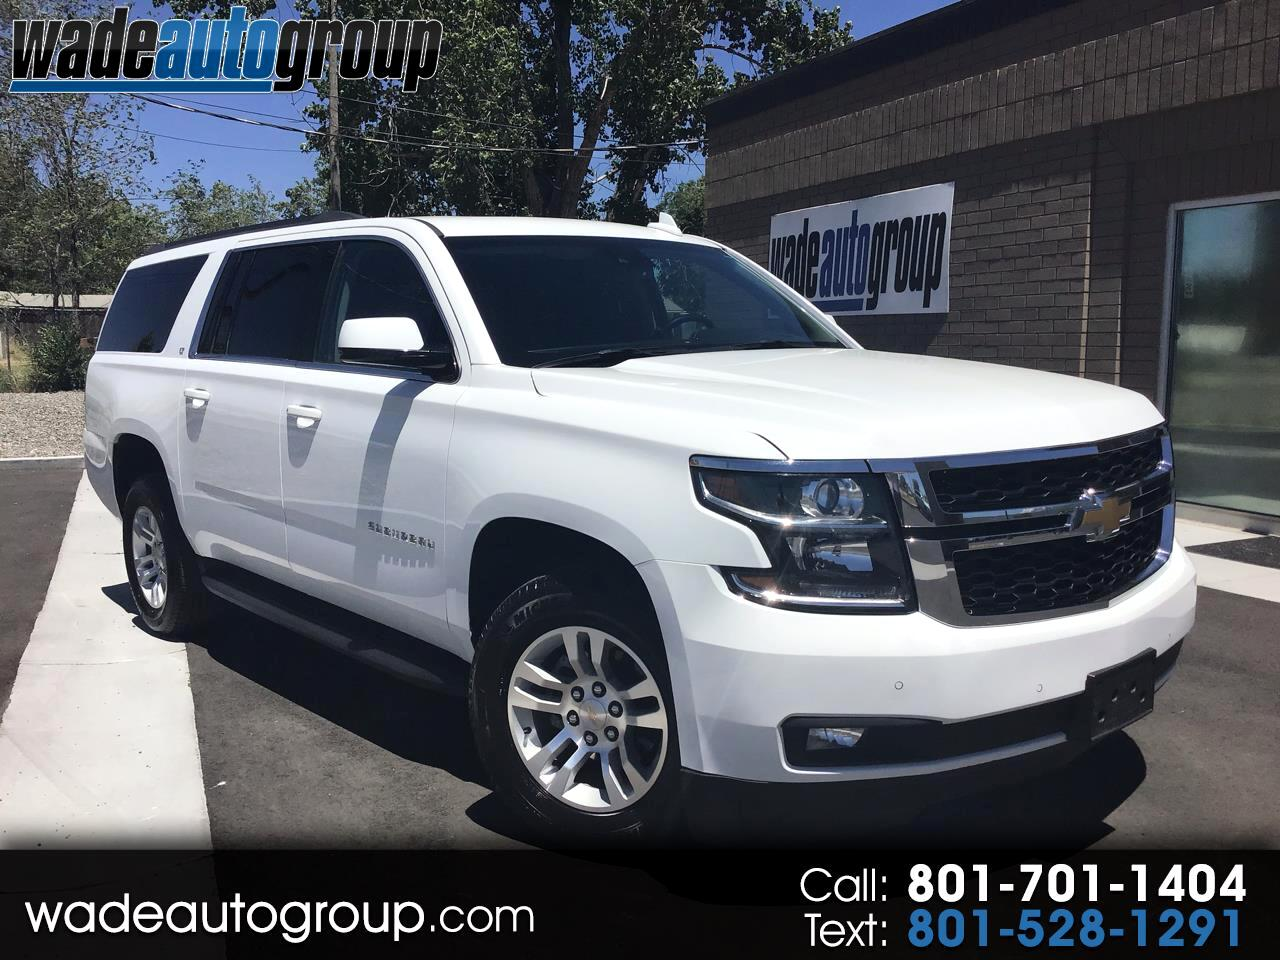 2018 Chevrolet Suburban LT 4WD W/Factory DVD 8 Passenger